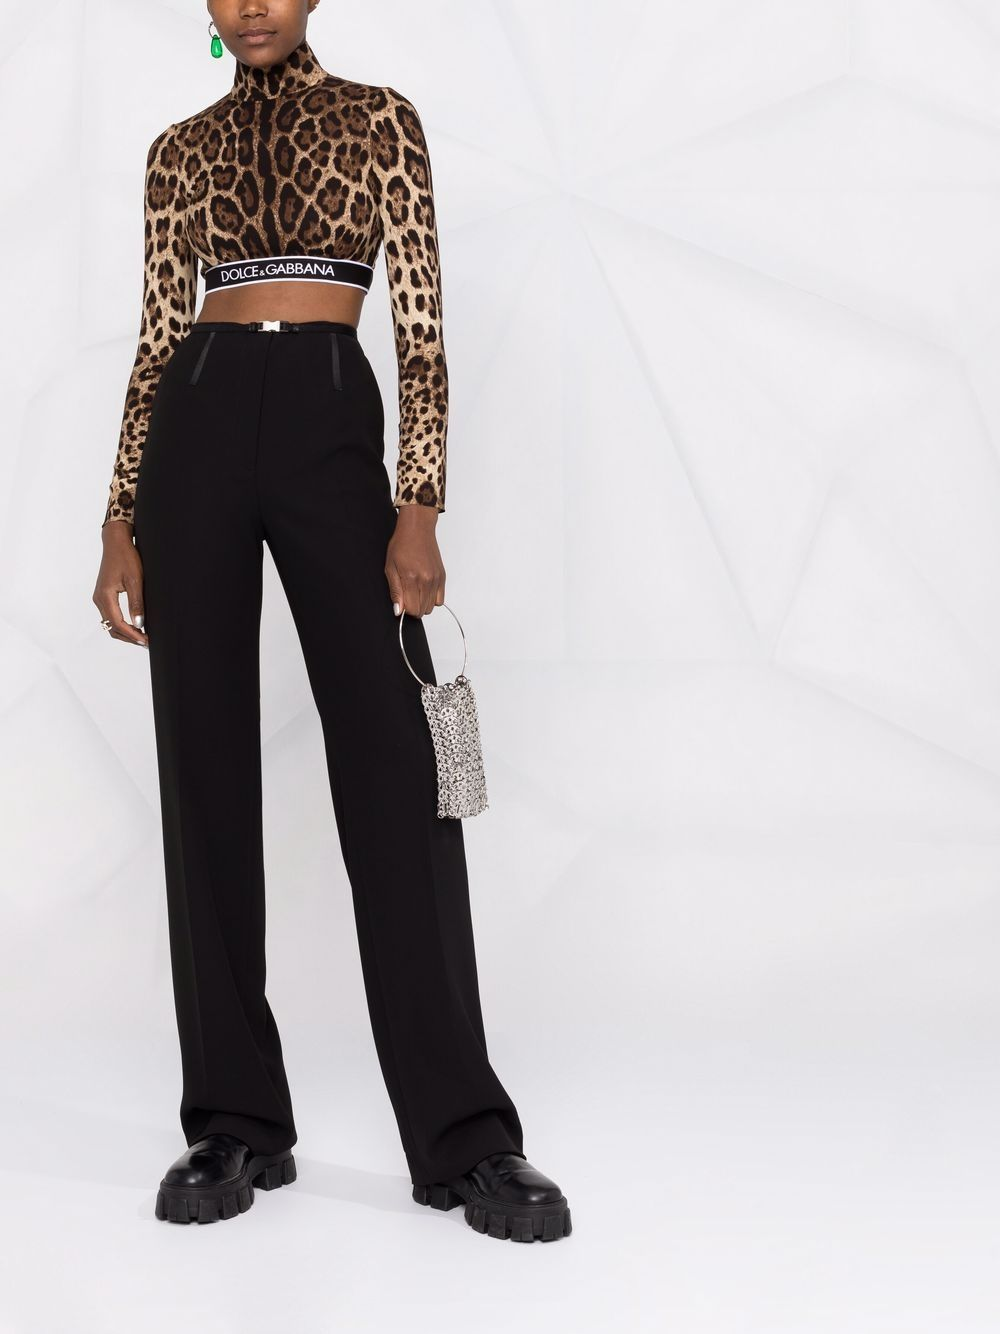 top corto in seta in stampa leopardata e logo Dolce & Gabbana DOLCE & GABBANA | Camicie | F75L8T-FSADDHY13M